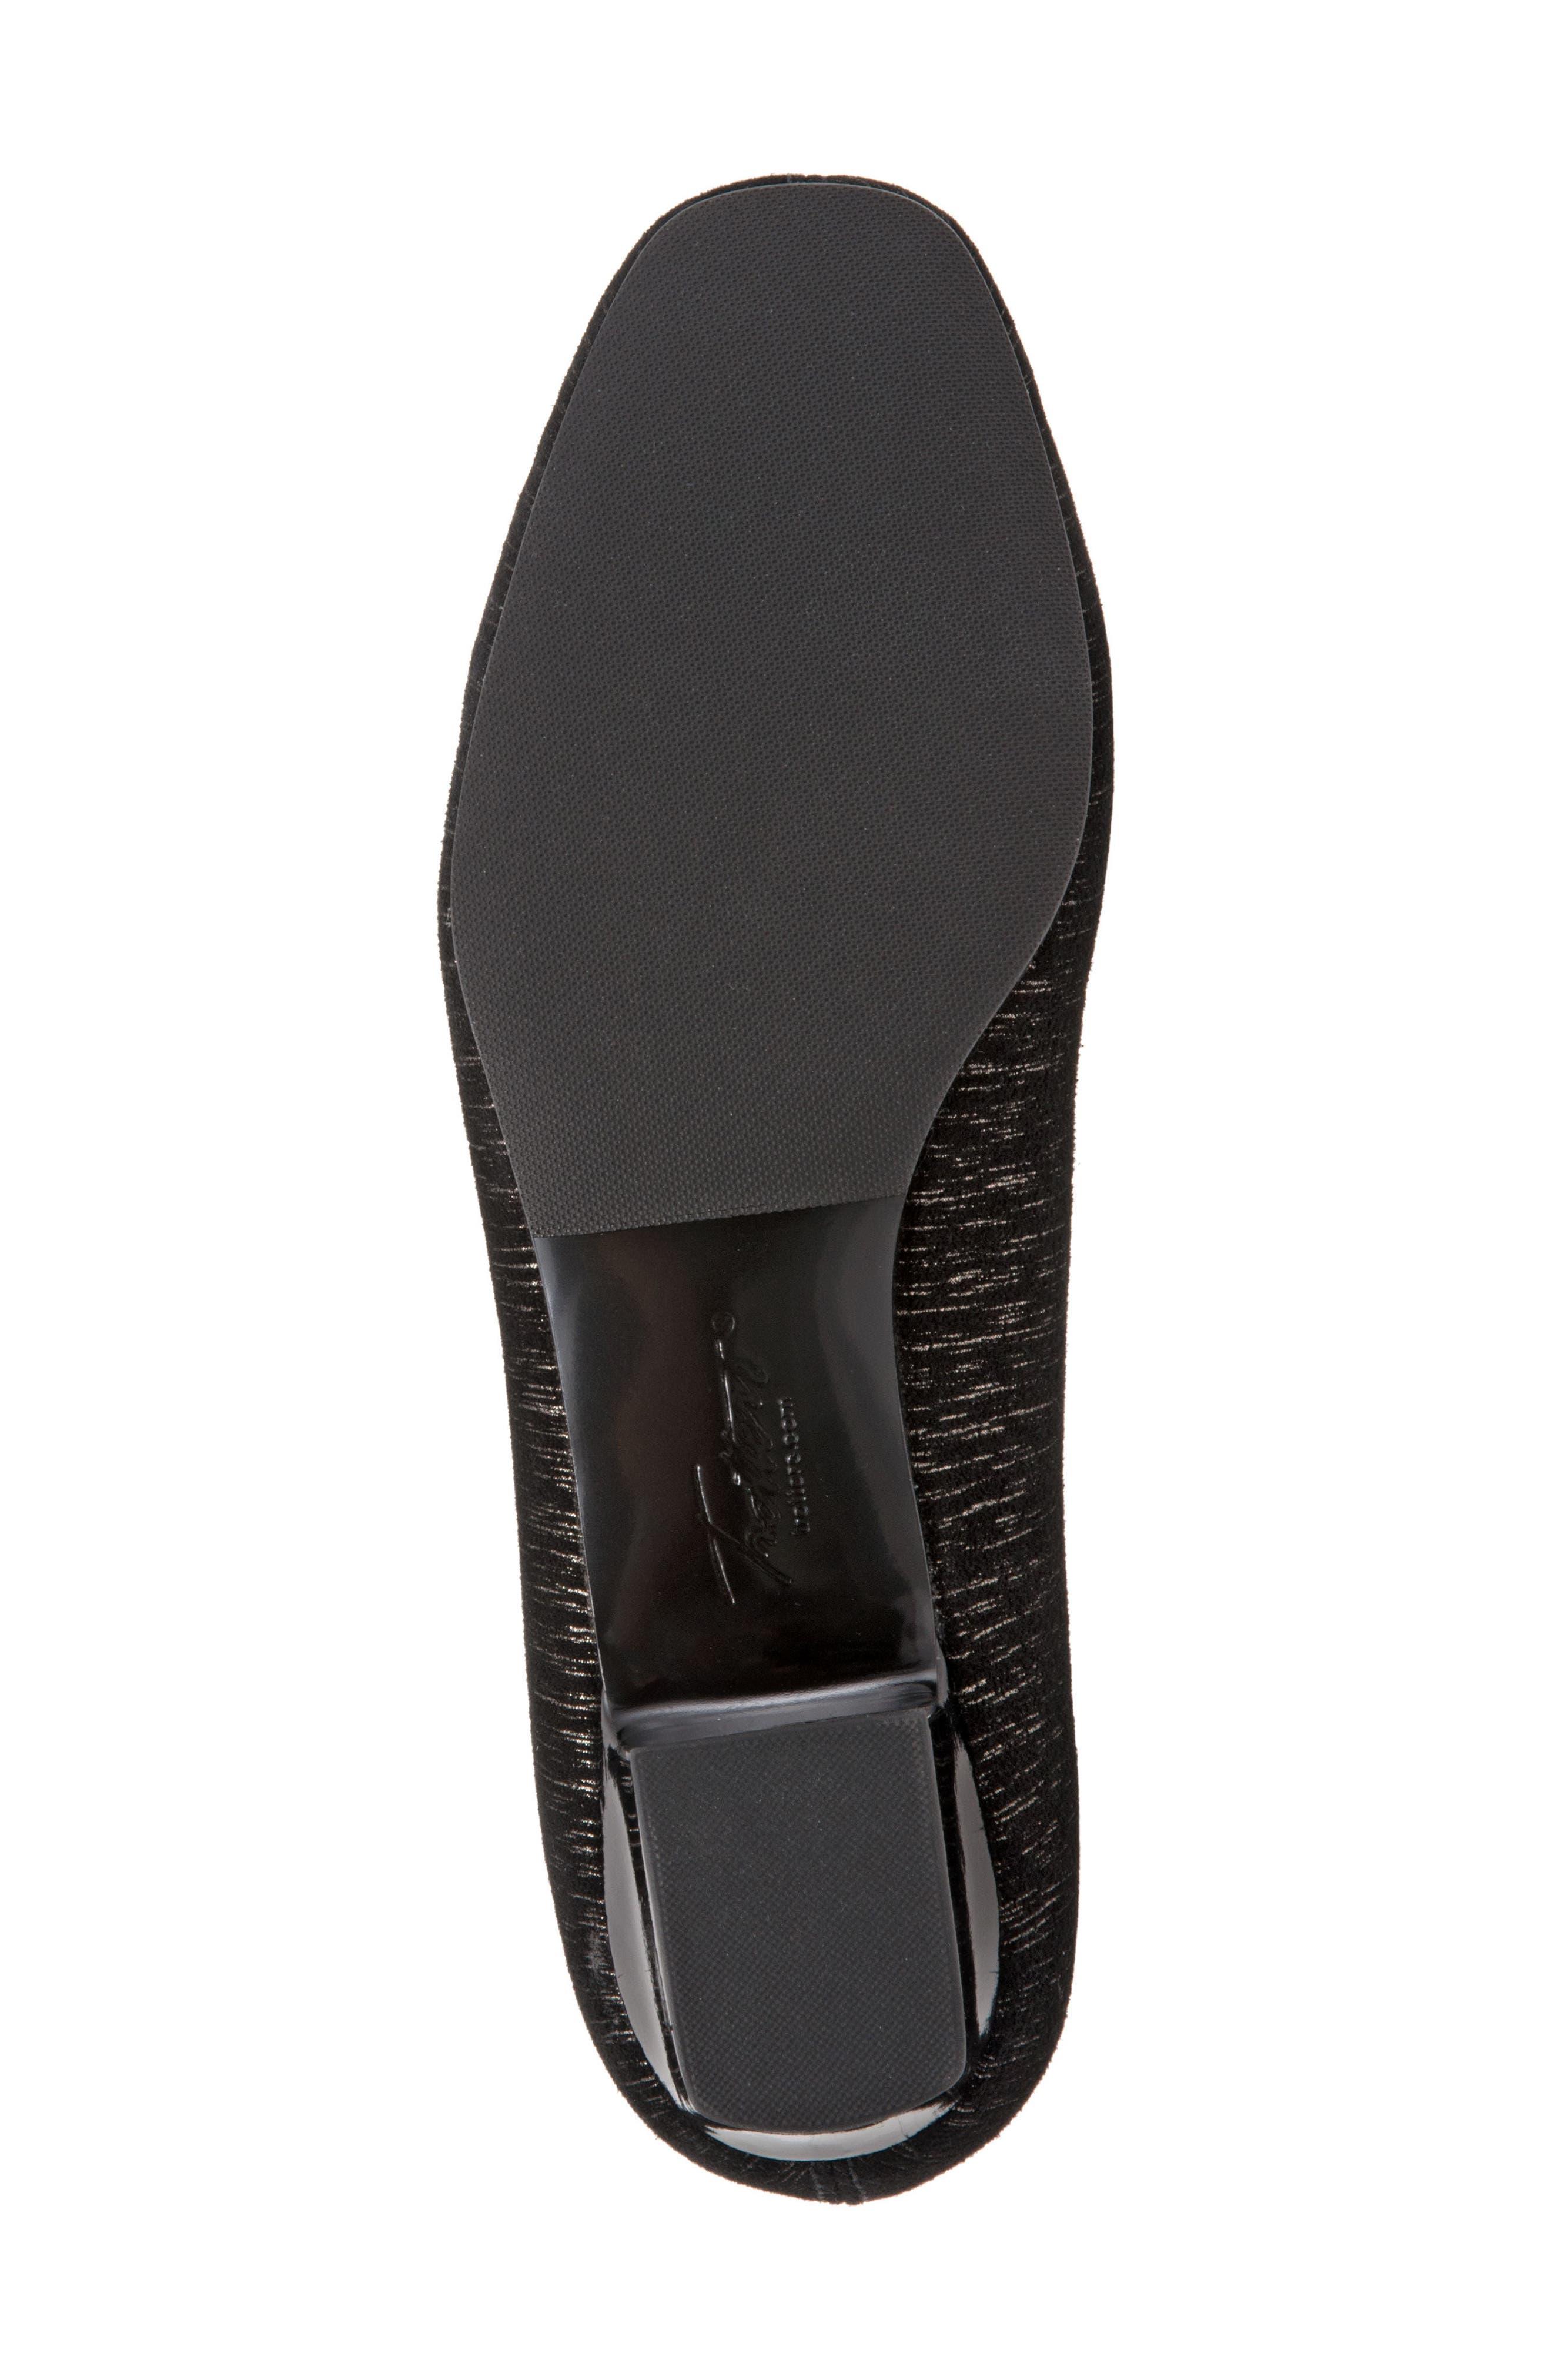 'Doris' Pump,                             Alternate thumbnail 6, color,                             Black/ Black Leather